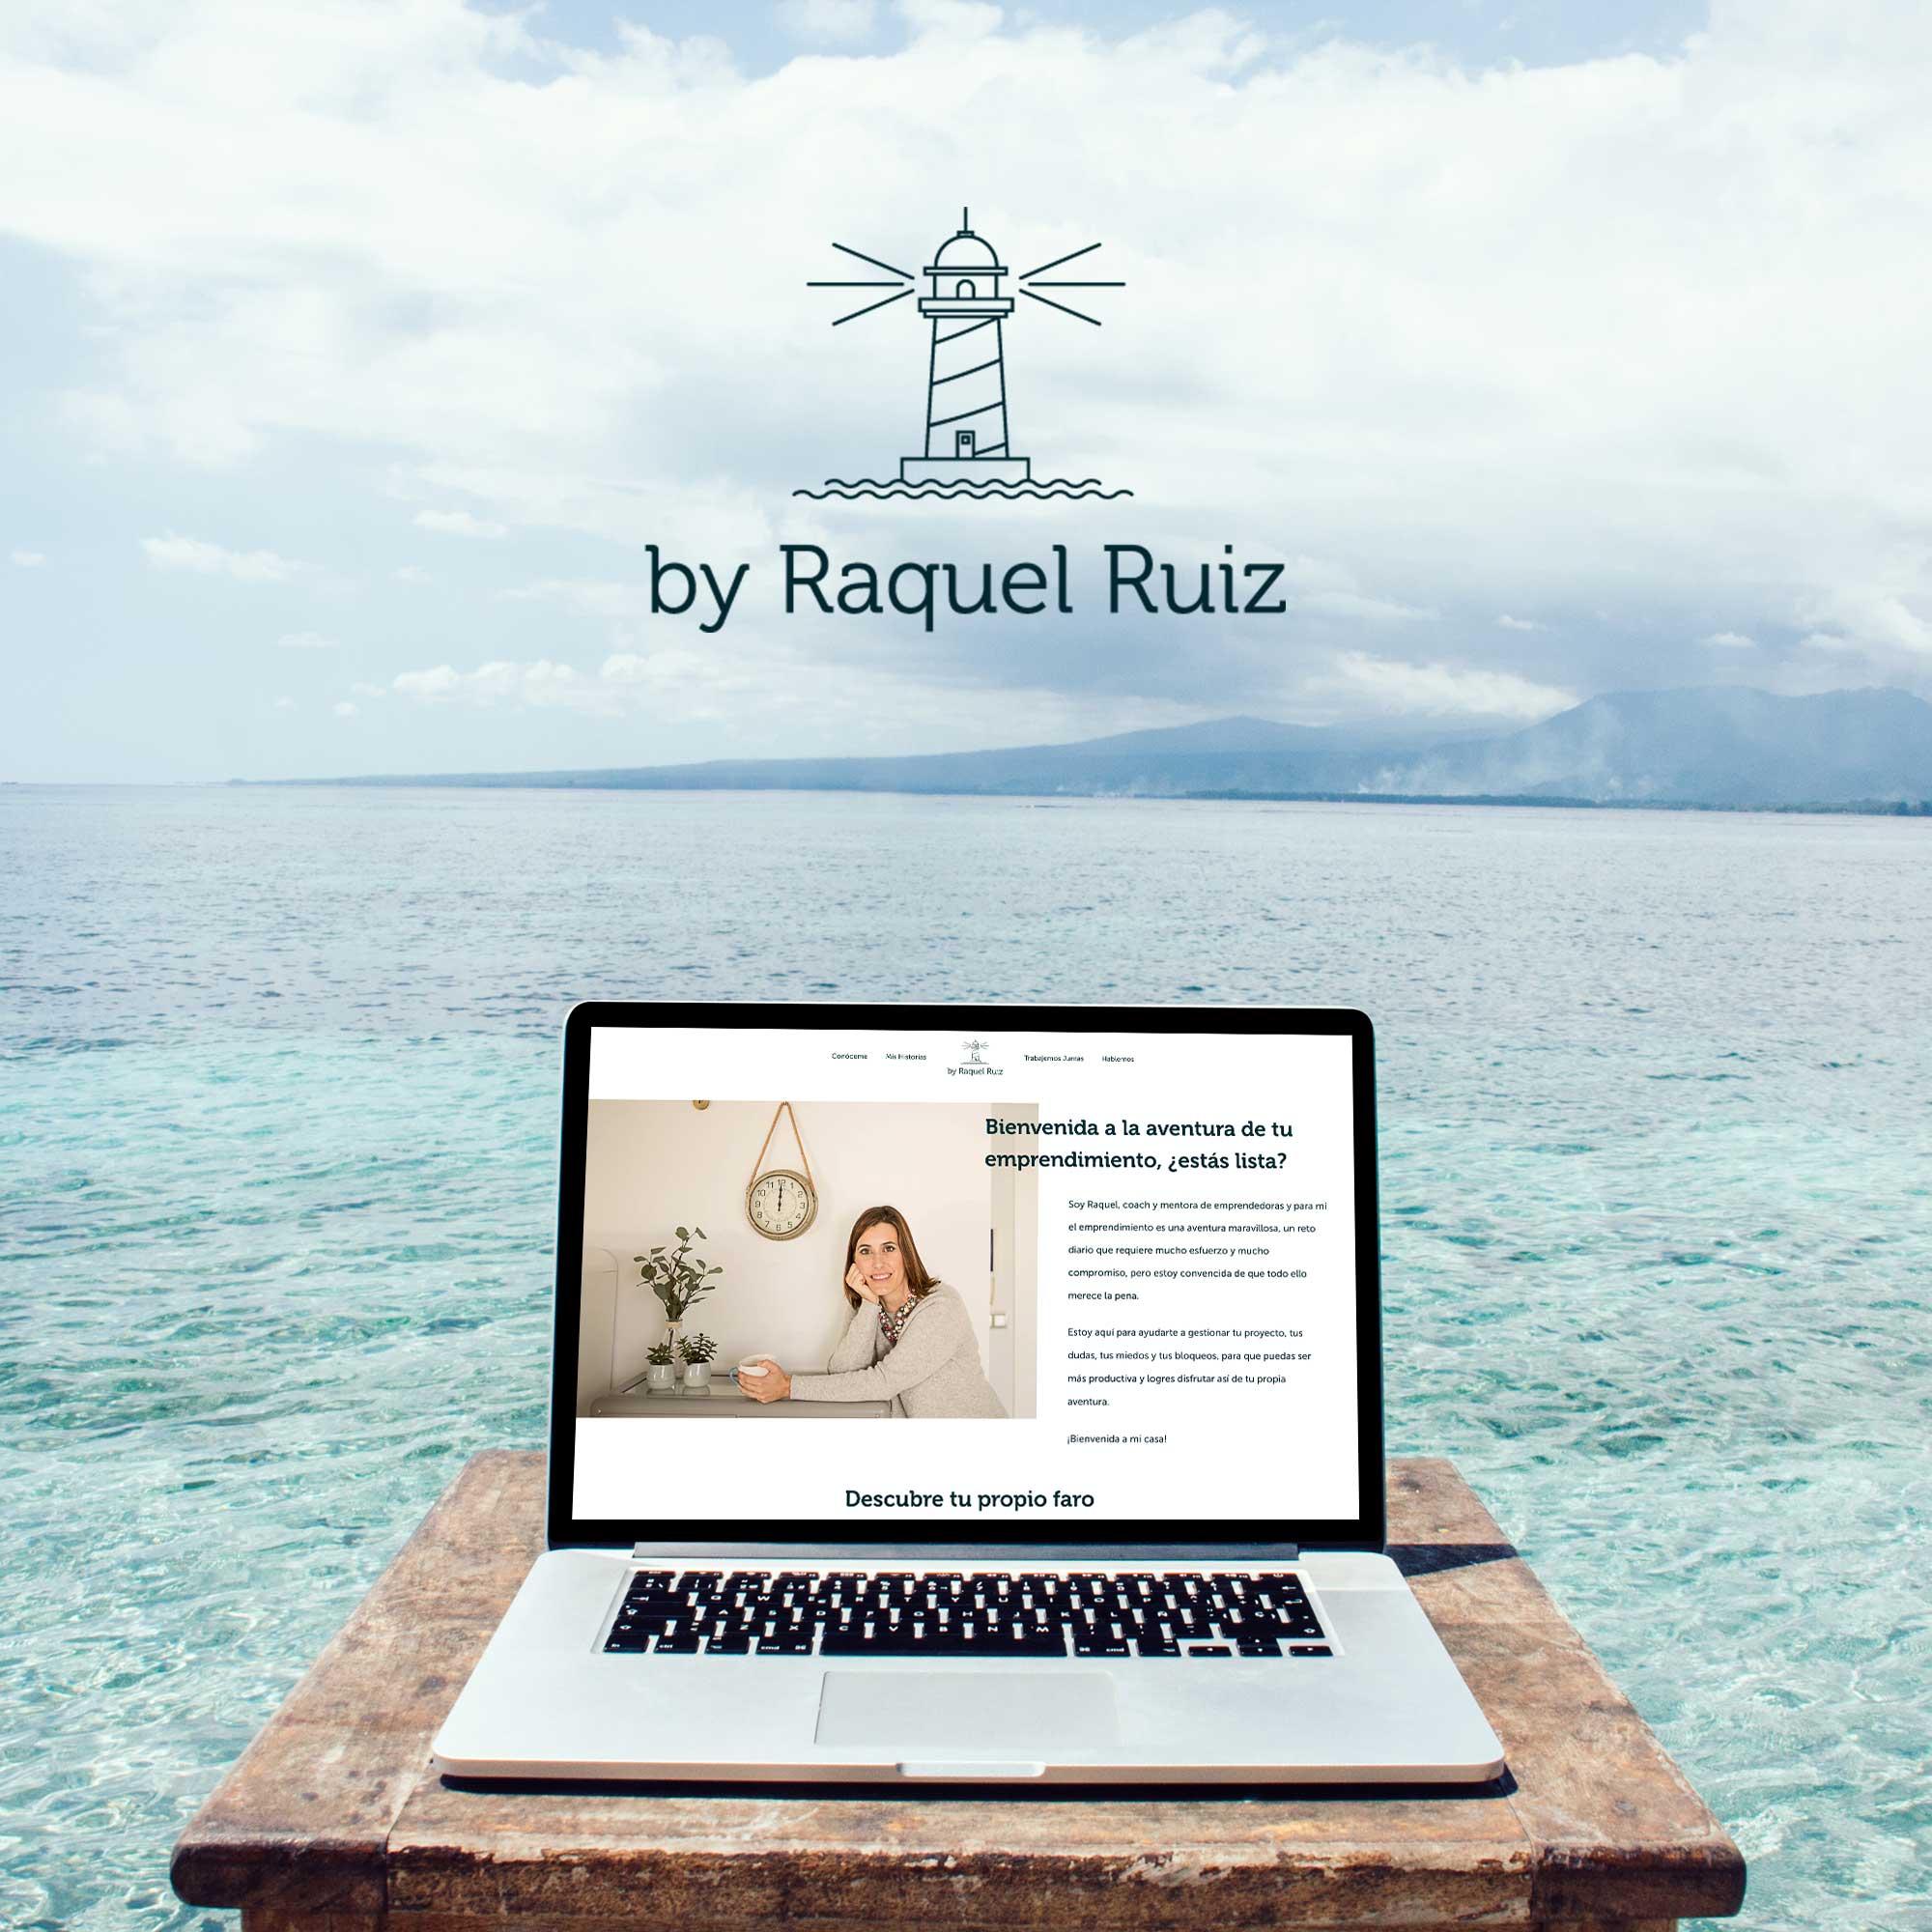 Web design for the coach By Raquel Ruiz - heartmade.es